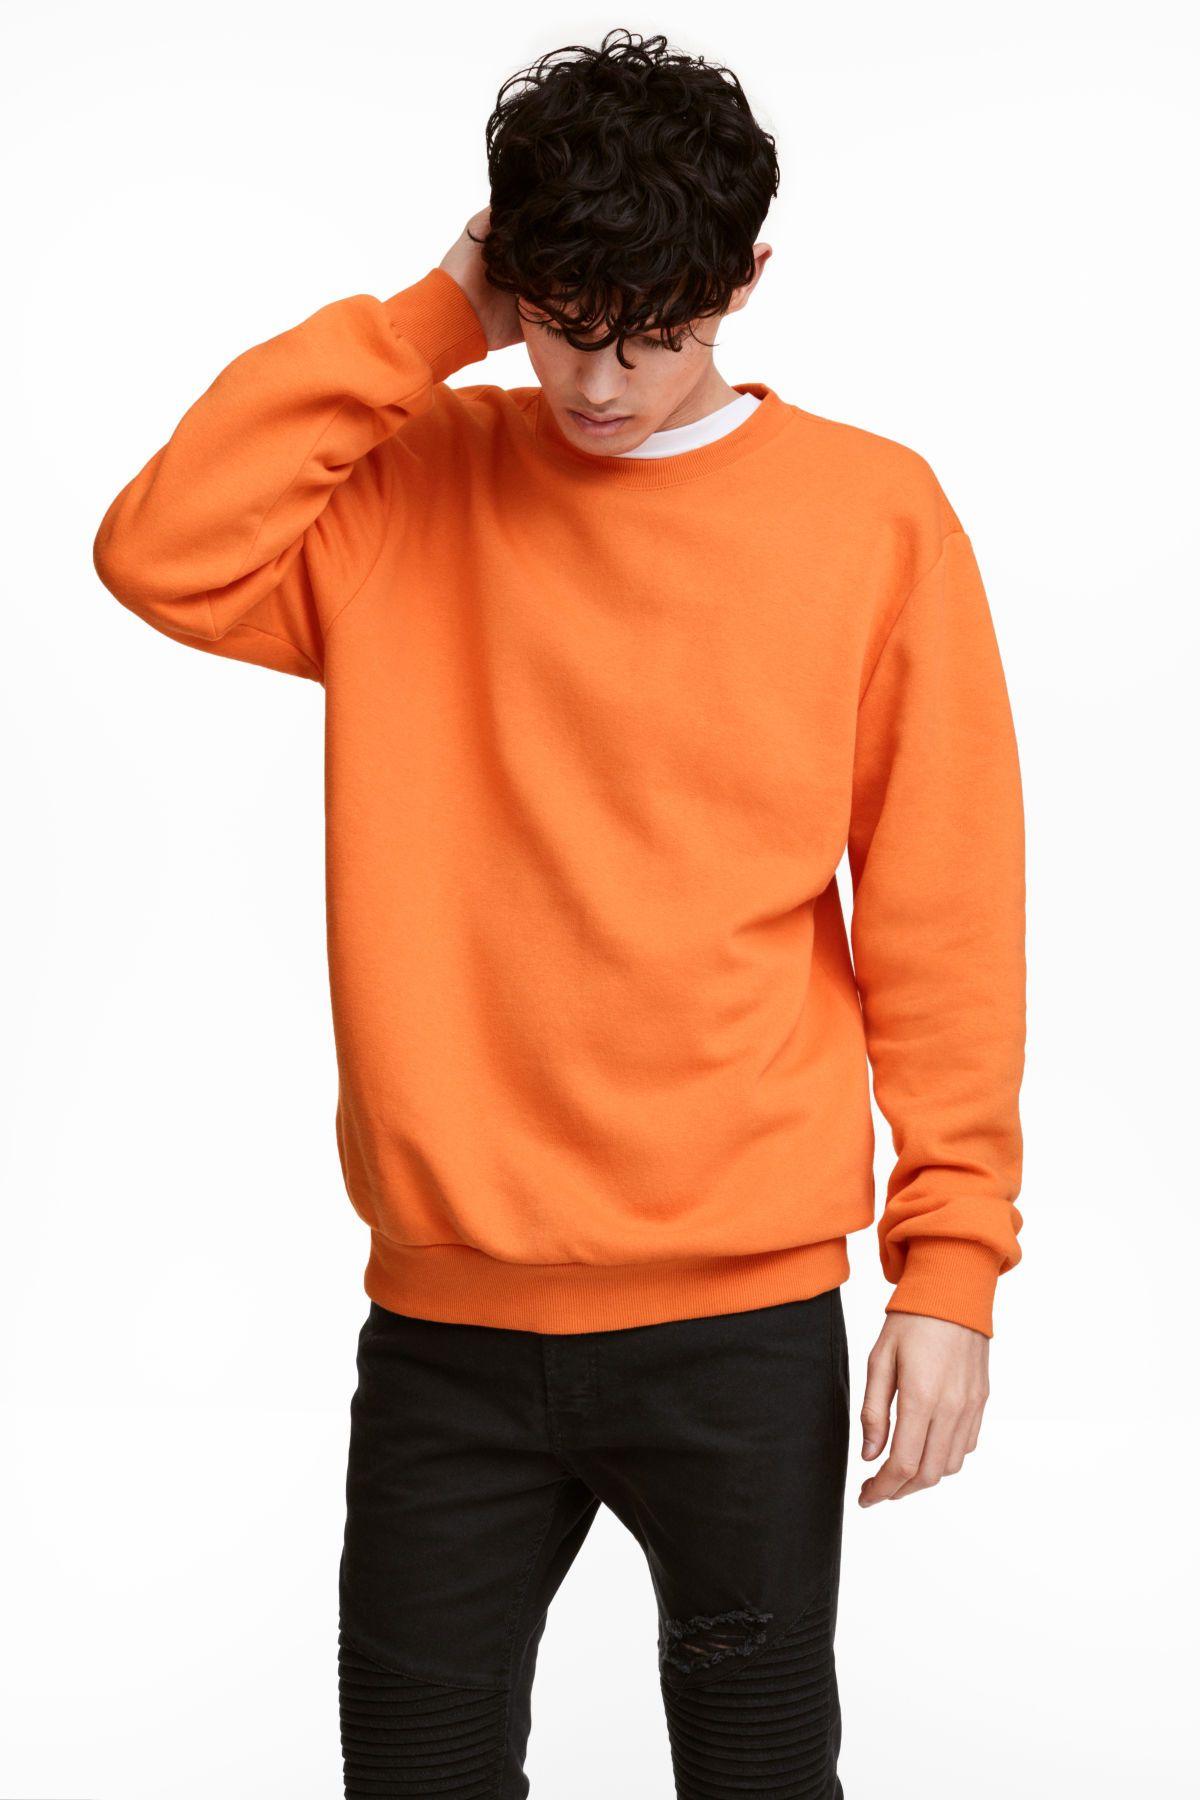 Relaxed Fit Sweatshirt Orange Men H M Us Black Outfit Men Japanese Street Fashion Men Sweatshirt Outfit Men [ 1800 x 1200 Pixel ]